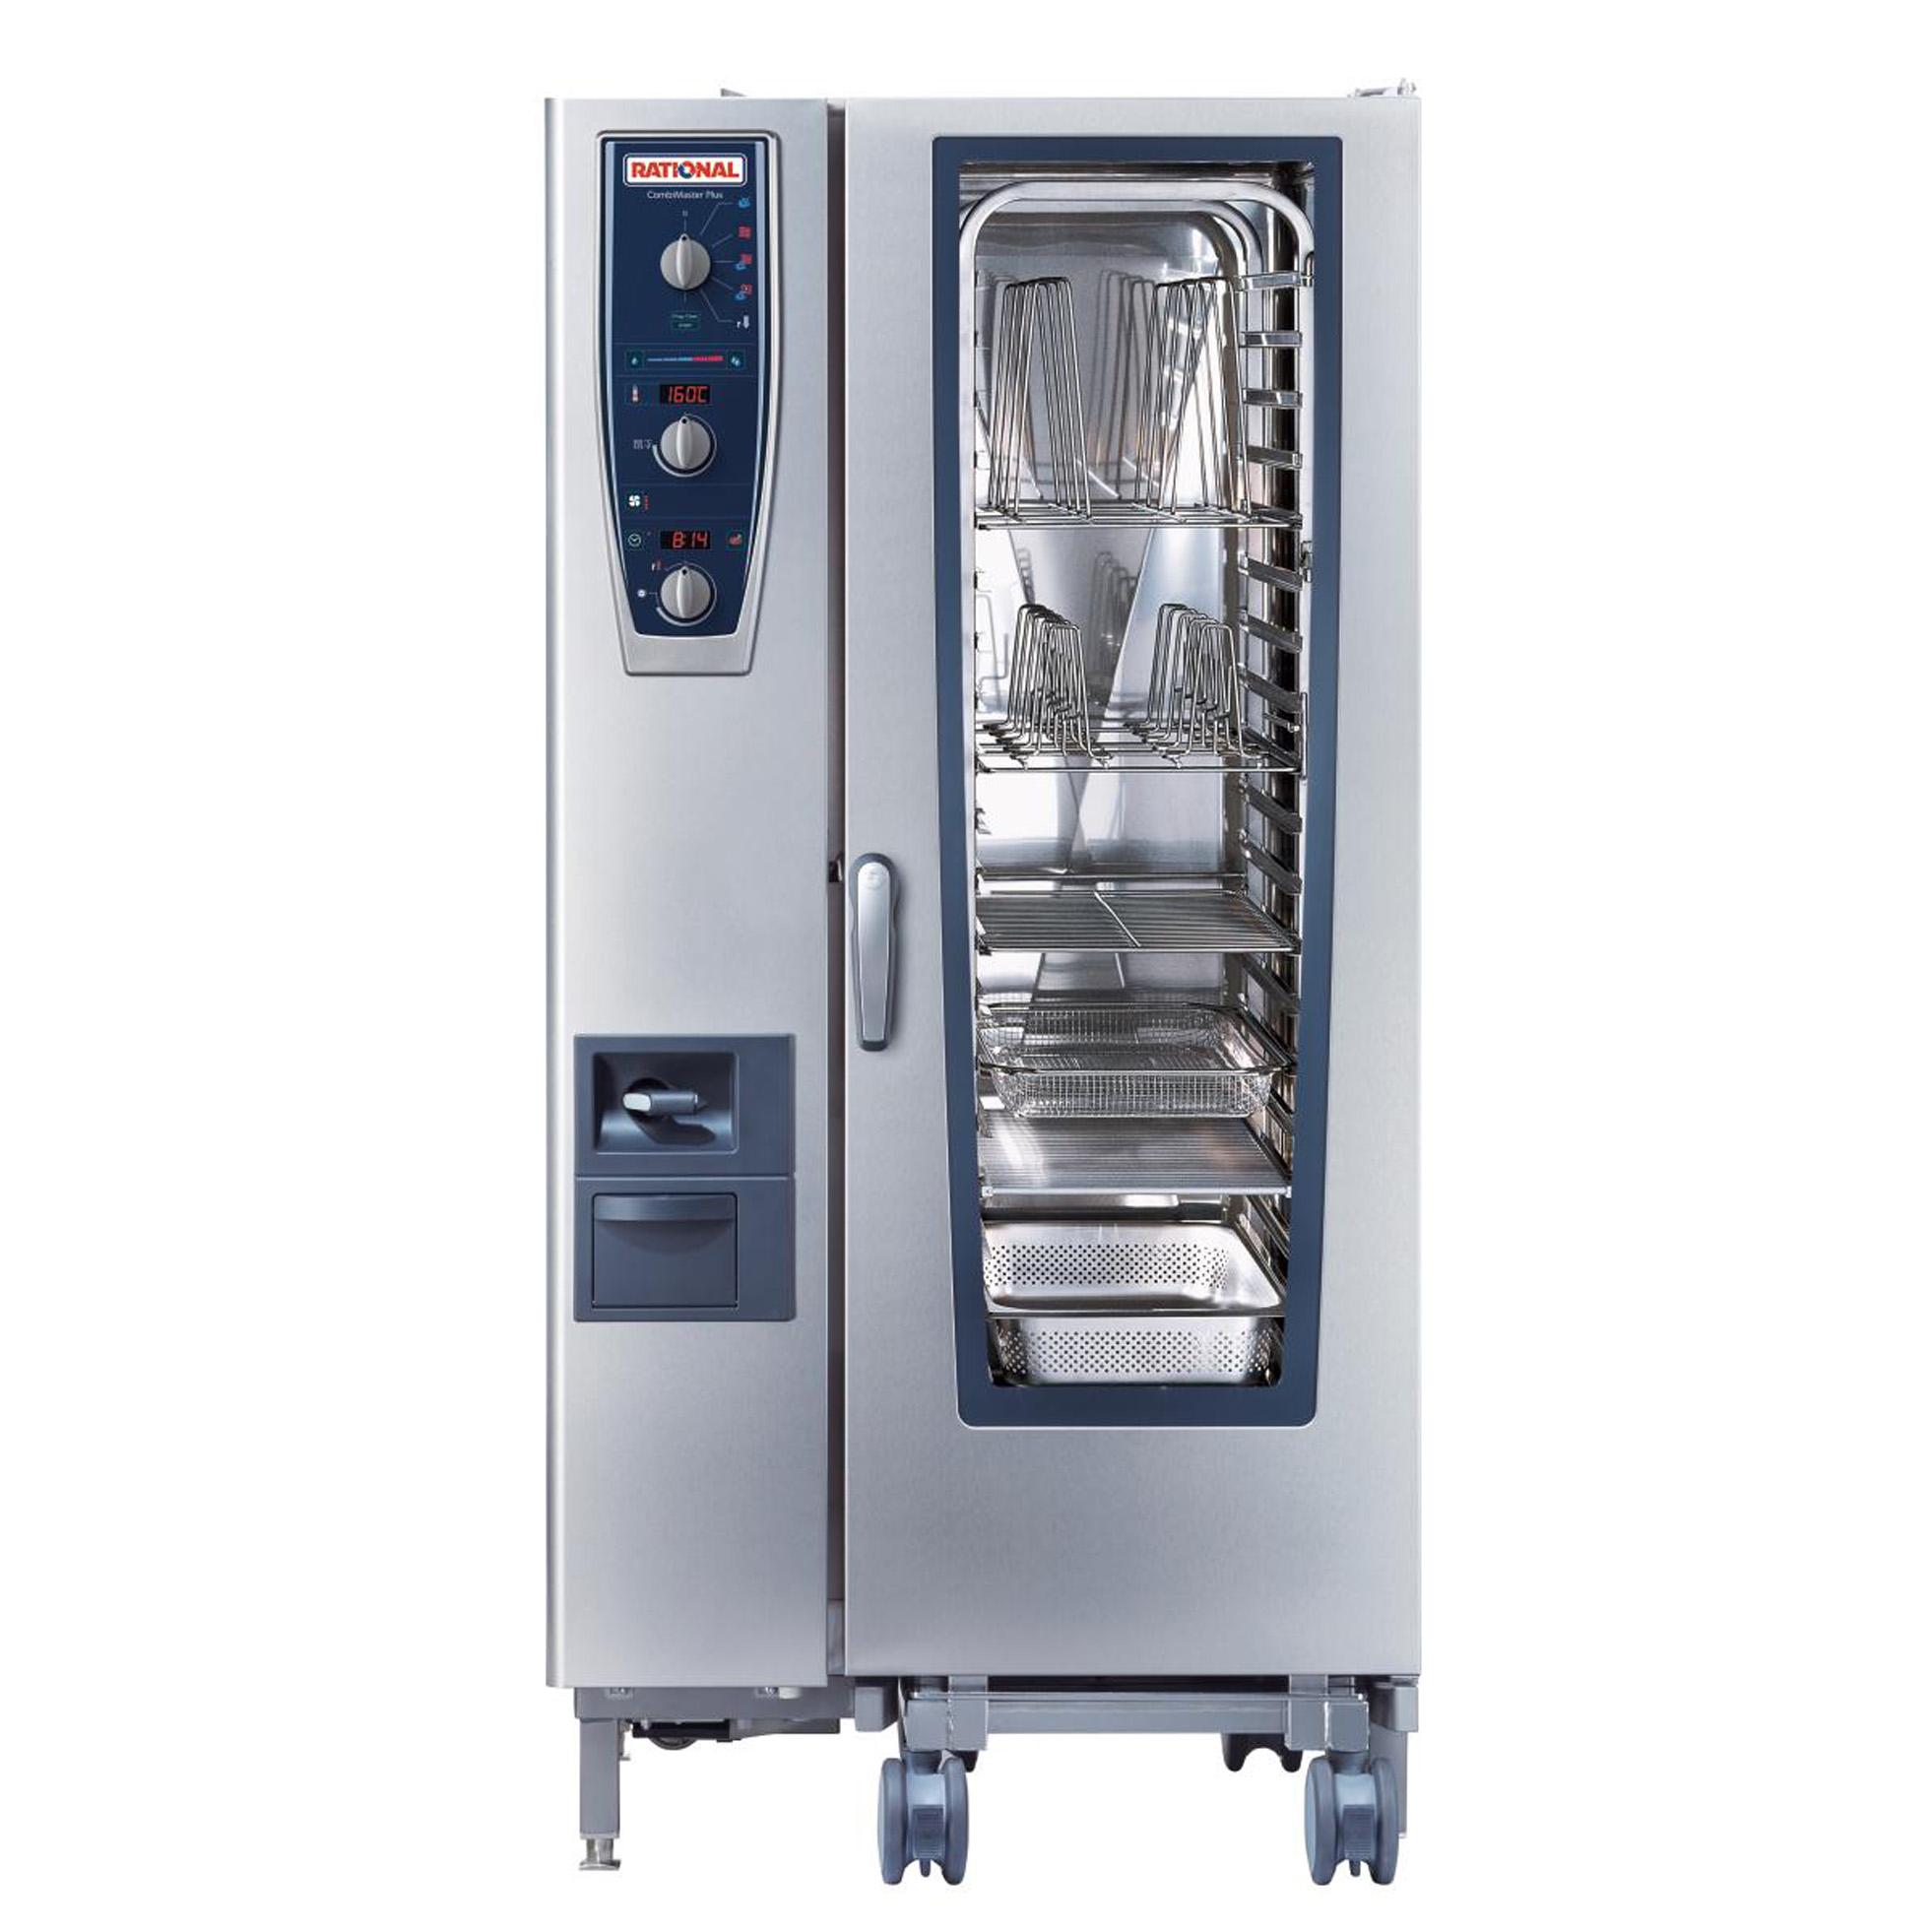 RATIONAL B219206.19E202 combi oven, gas